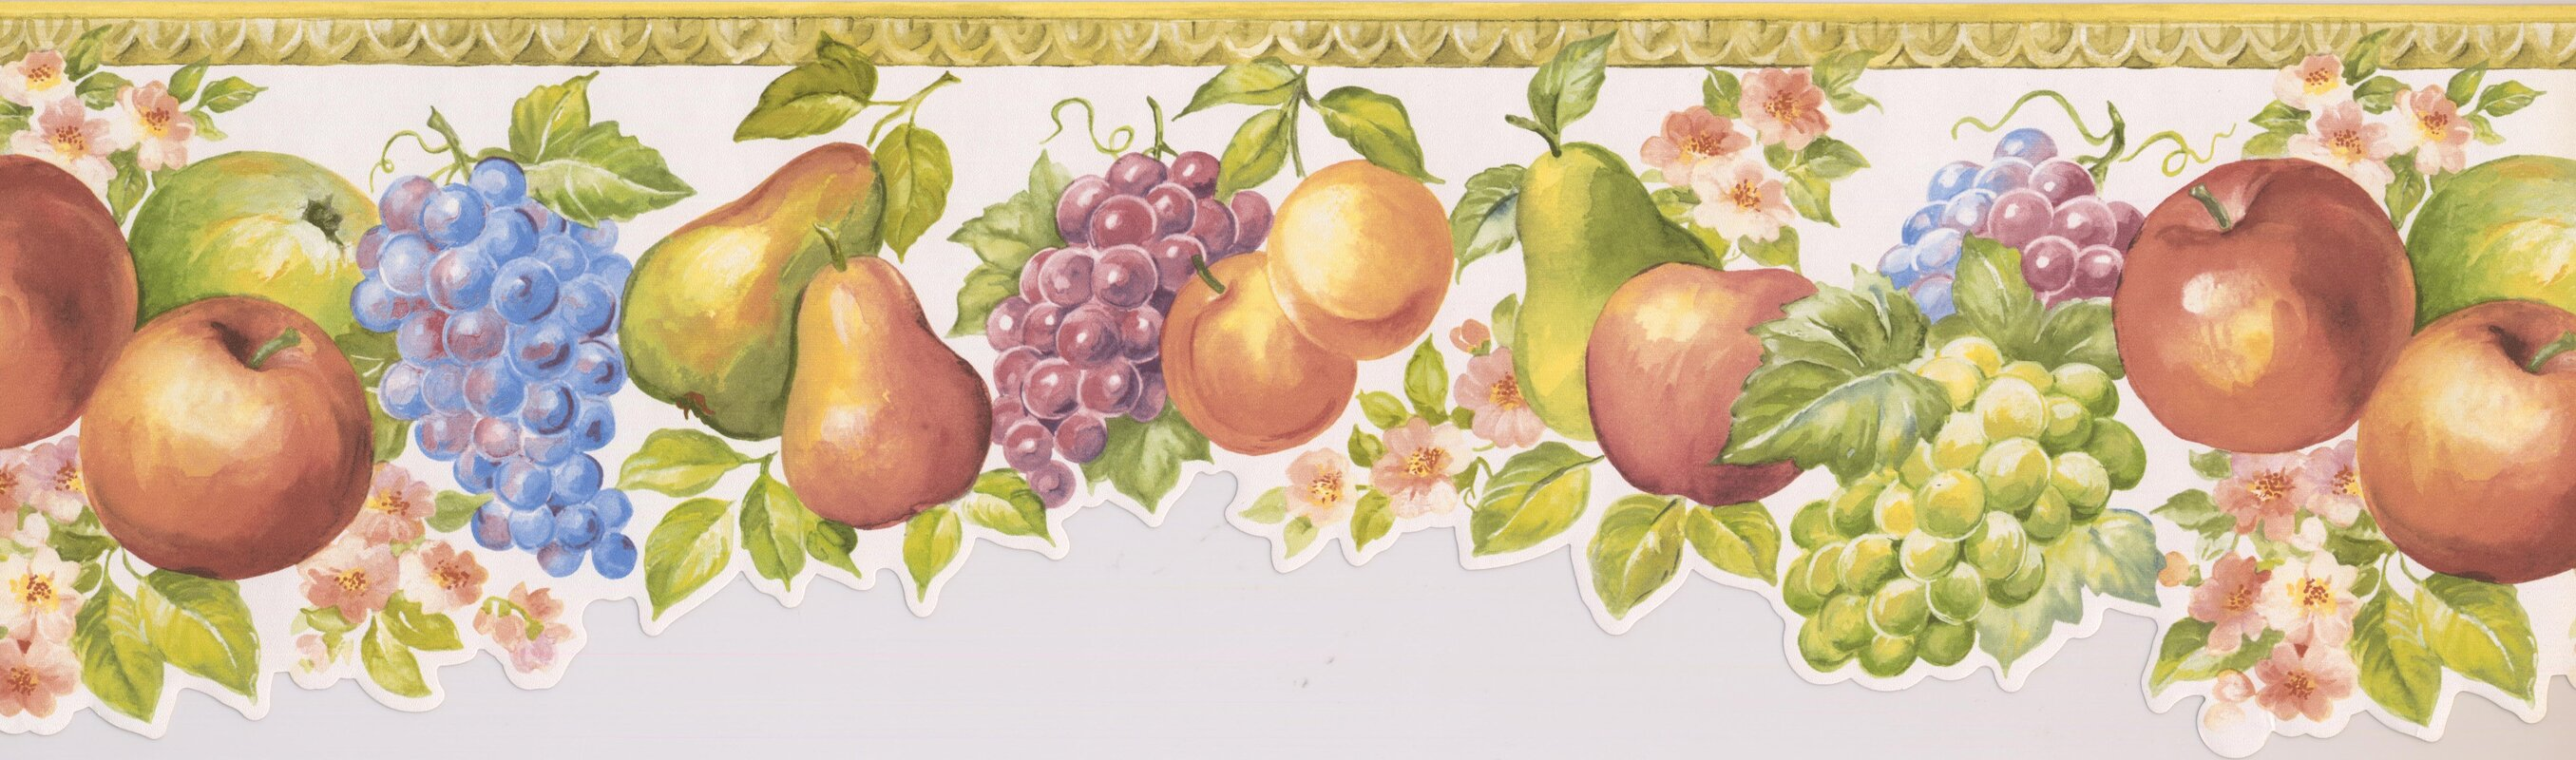 York Wallcoverings 15\' L x 6.75\'\' W Fruits Apple Pear Grapes Peach ...